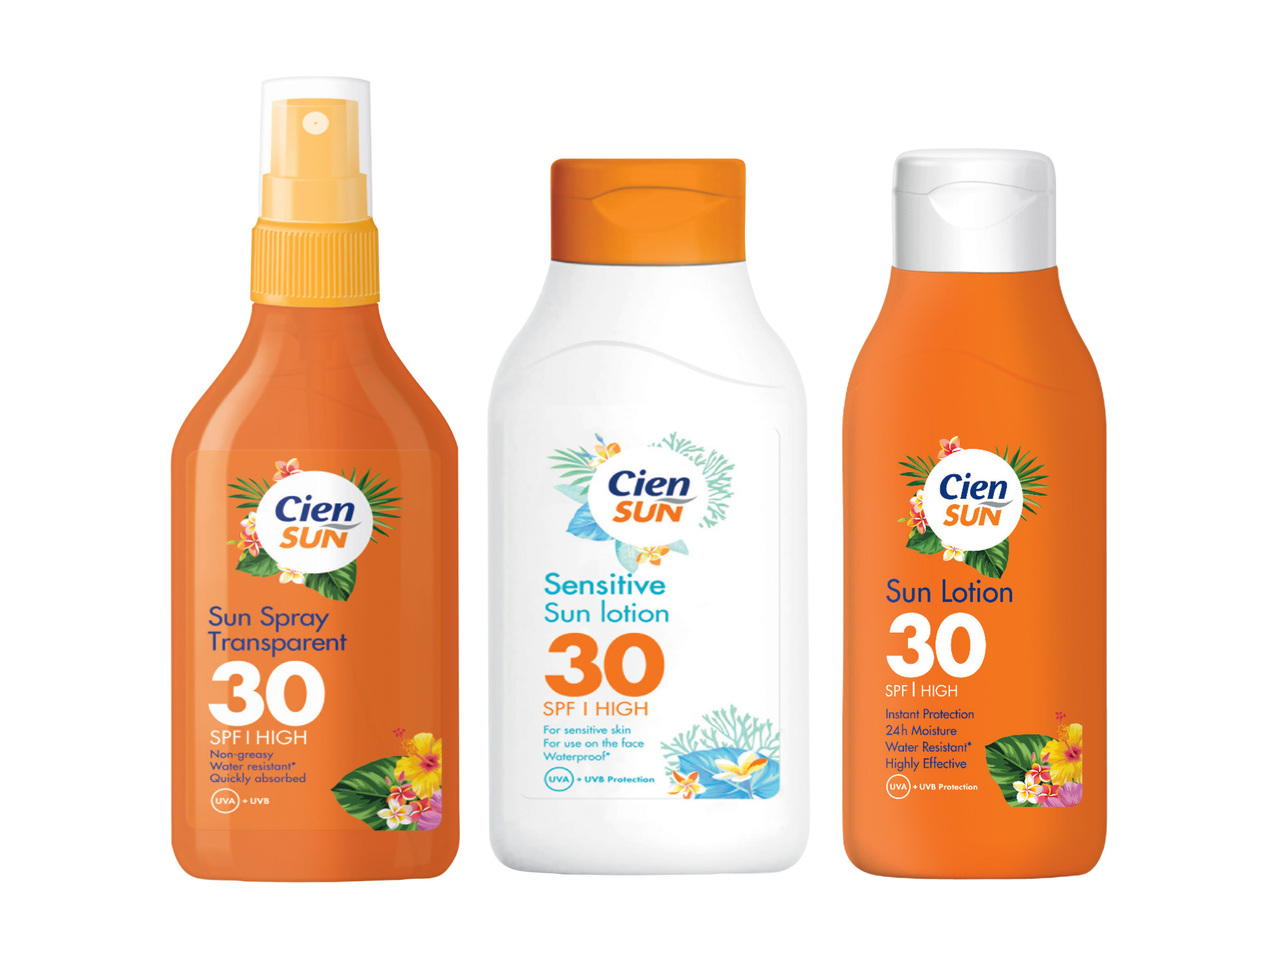 Cien Sun Sun Spray Transparent, Cien Sun Sensitive Sun Lotion, Cien Sun Lotion SPF 30